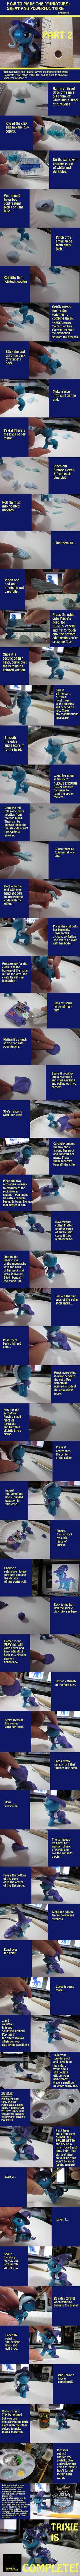 TUTORIAL PART 2: The Making of Mini Trixie by minnichi.deviantart.com on @deviantART